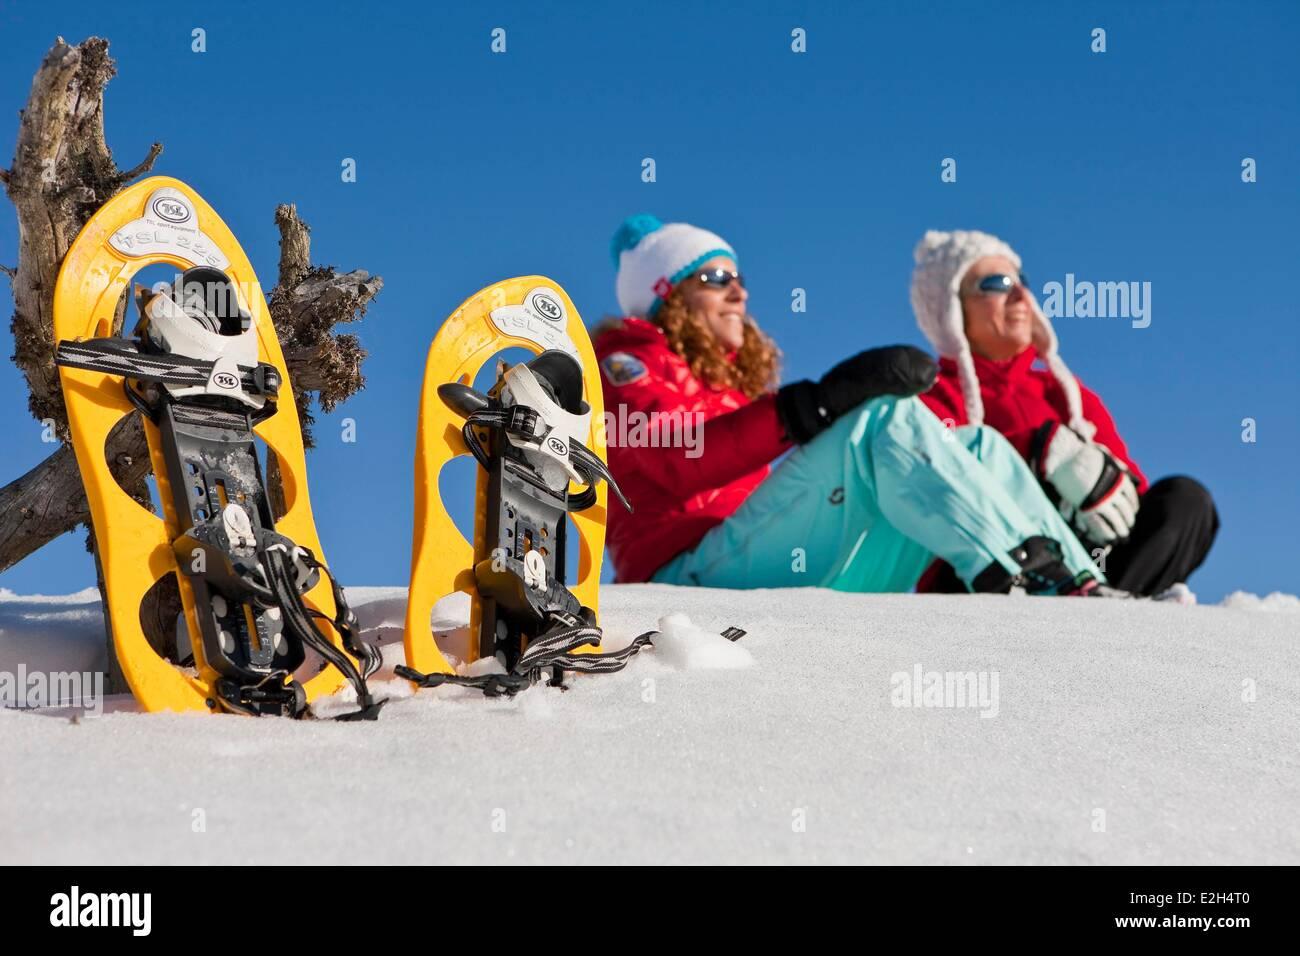 France Isère Chamrousse femmes sports d'hiver Photo Stock